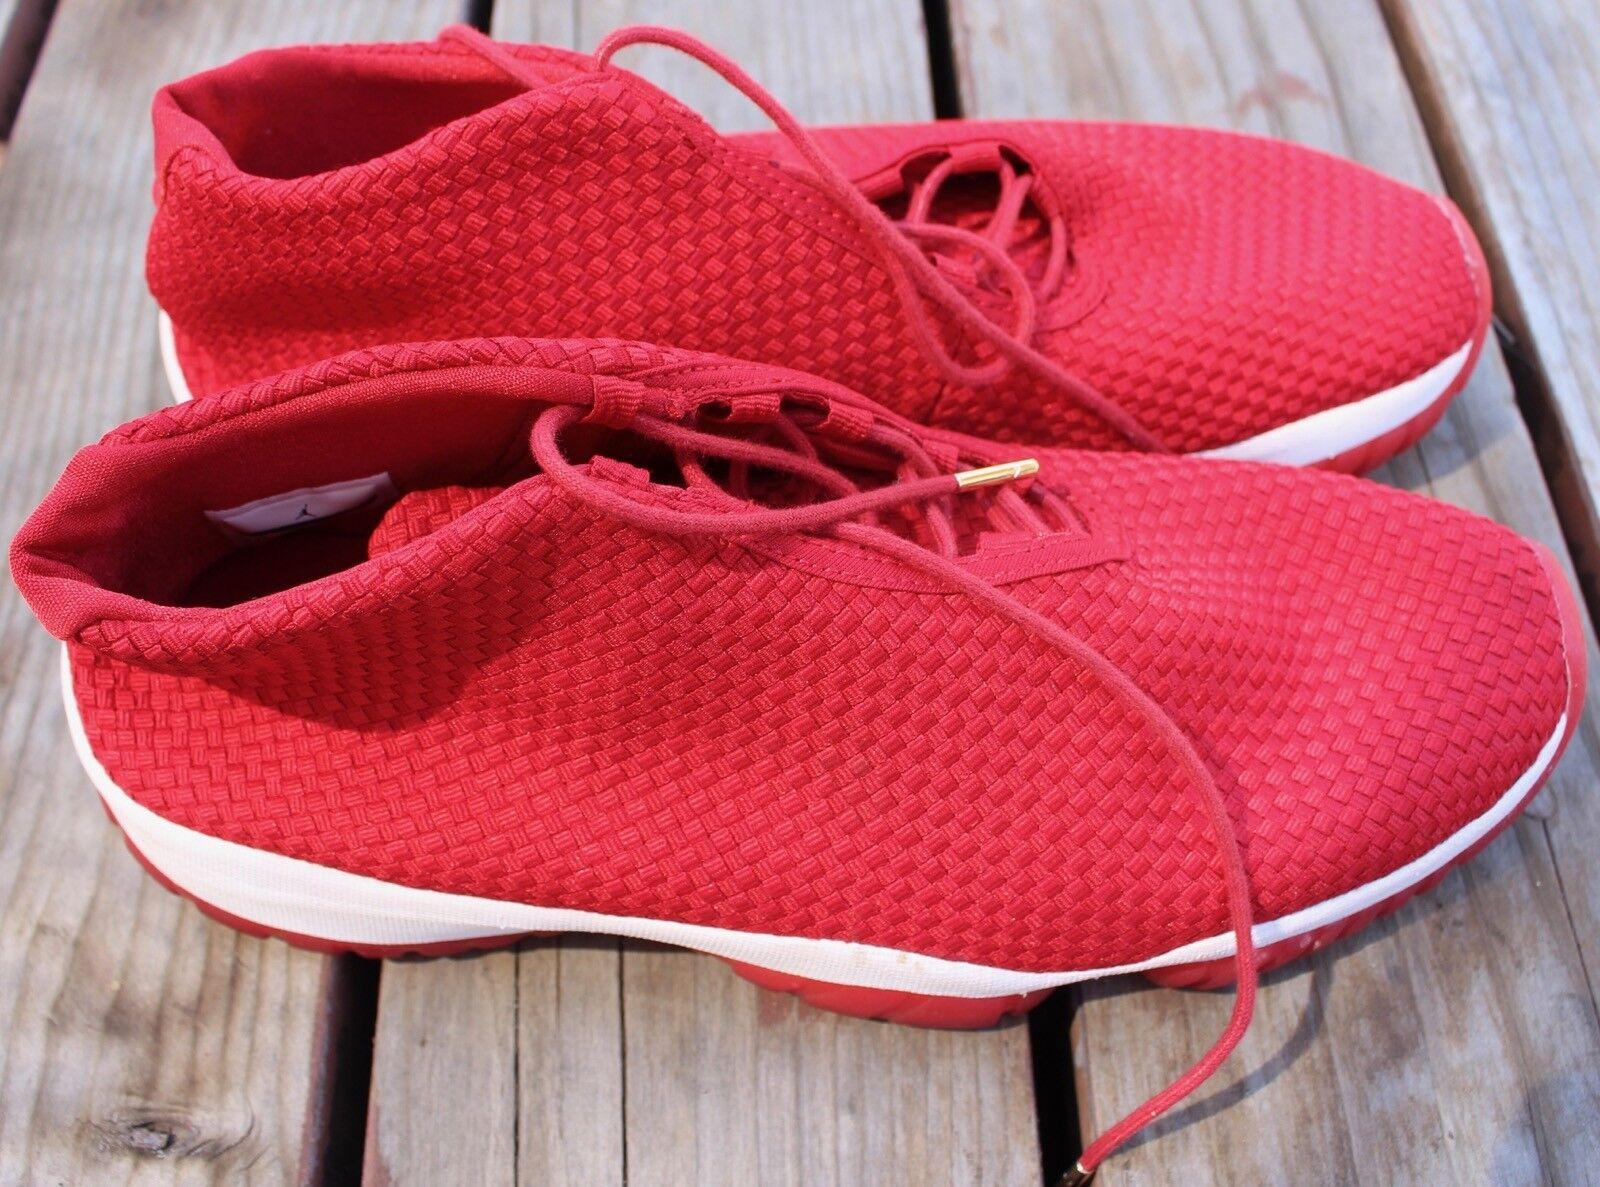 Nike Air Jordan Future Shoes 656503-601 Gym Red White w/ Original Box Comfortable Brand discount